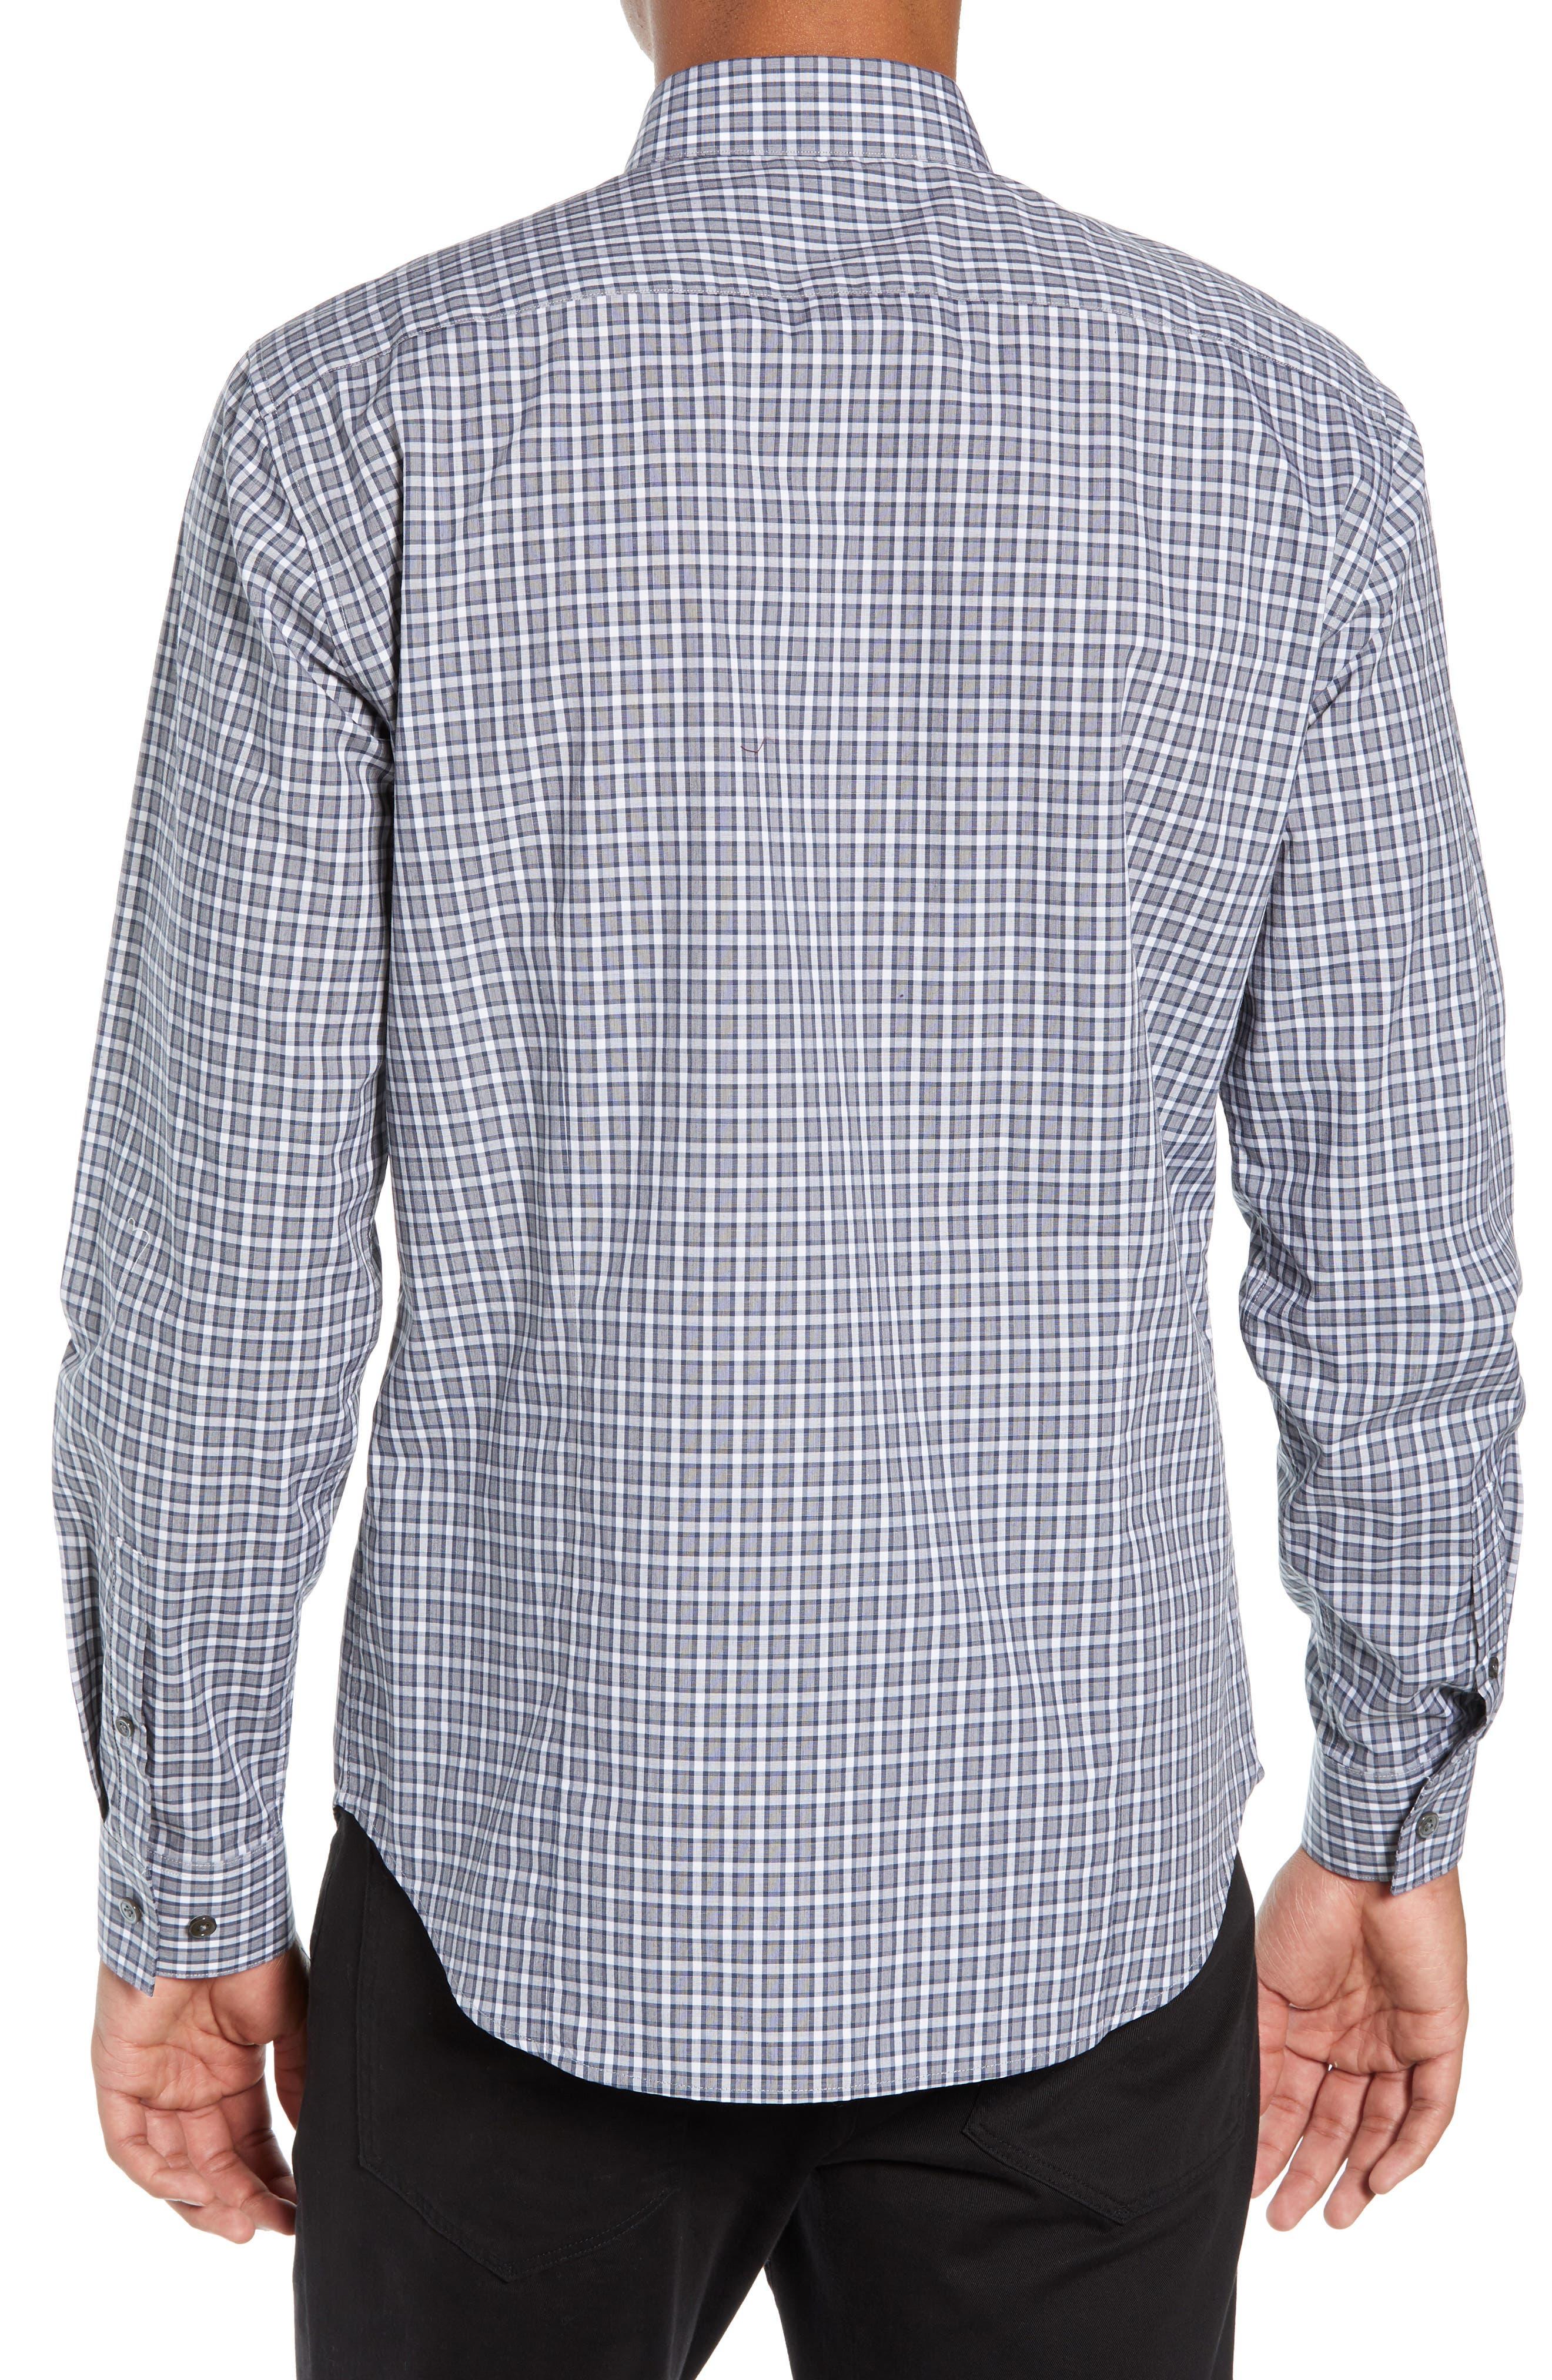 Sylvain Regular Fit Check Sport Shirt,                             Alternate thumbnail 3, color,                             NAVY MULTI